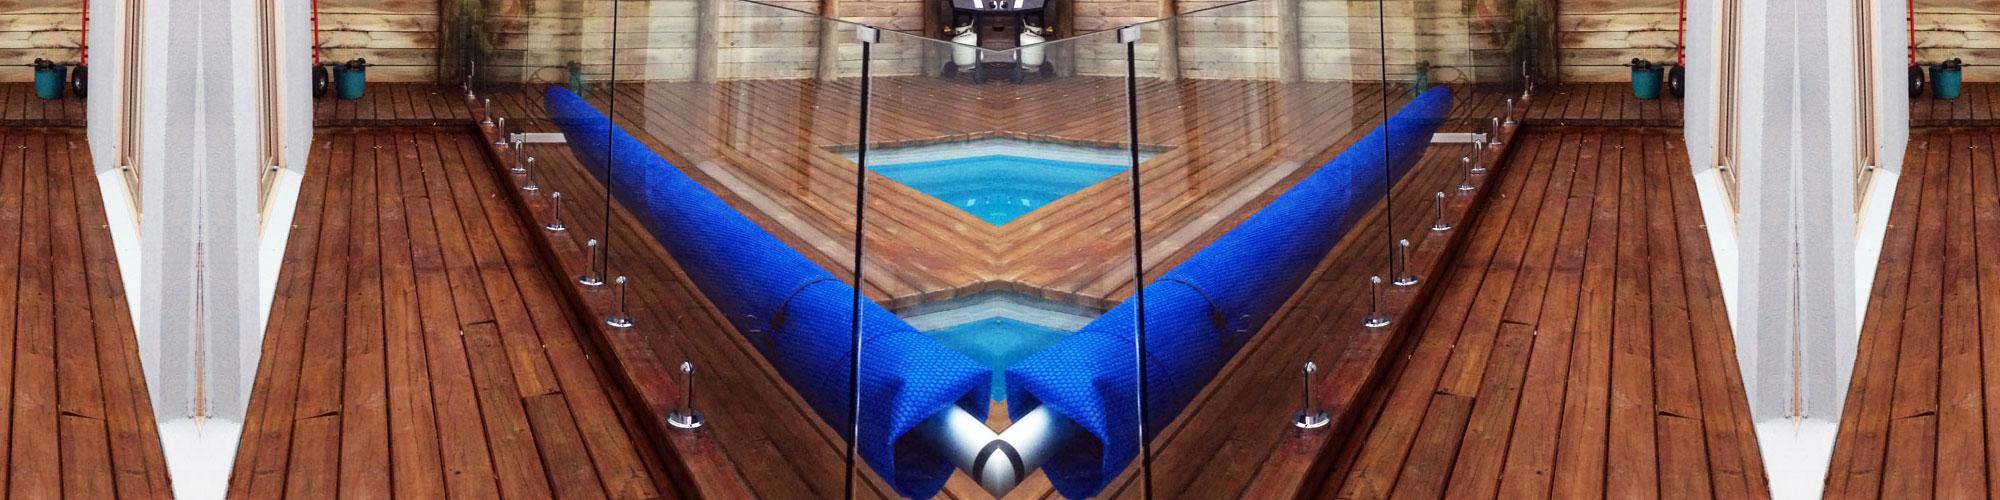 glass-pool-fencing-slider